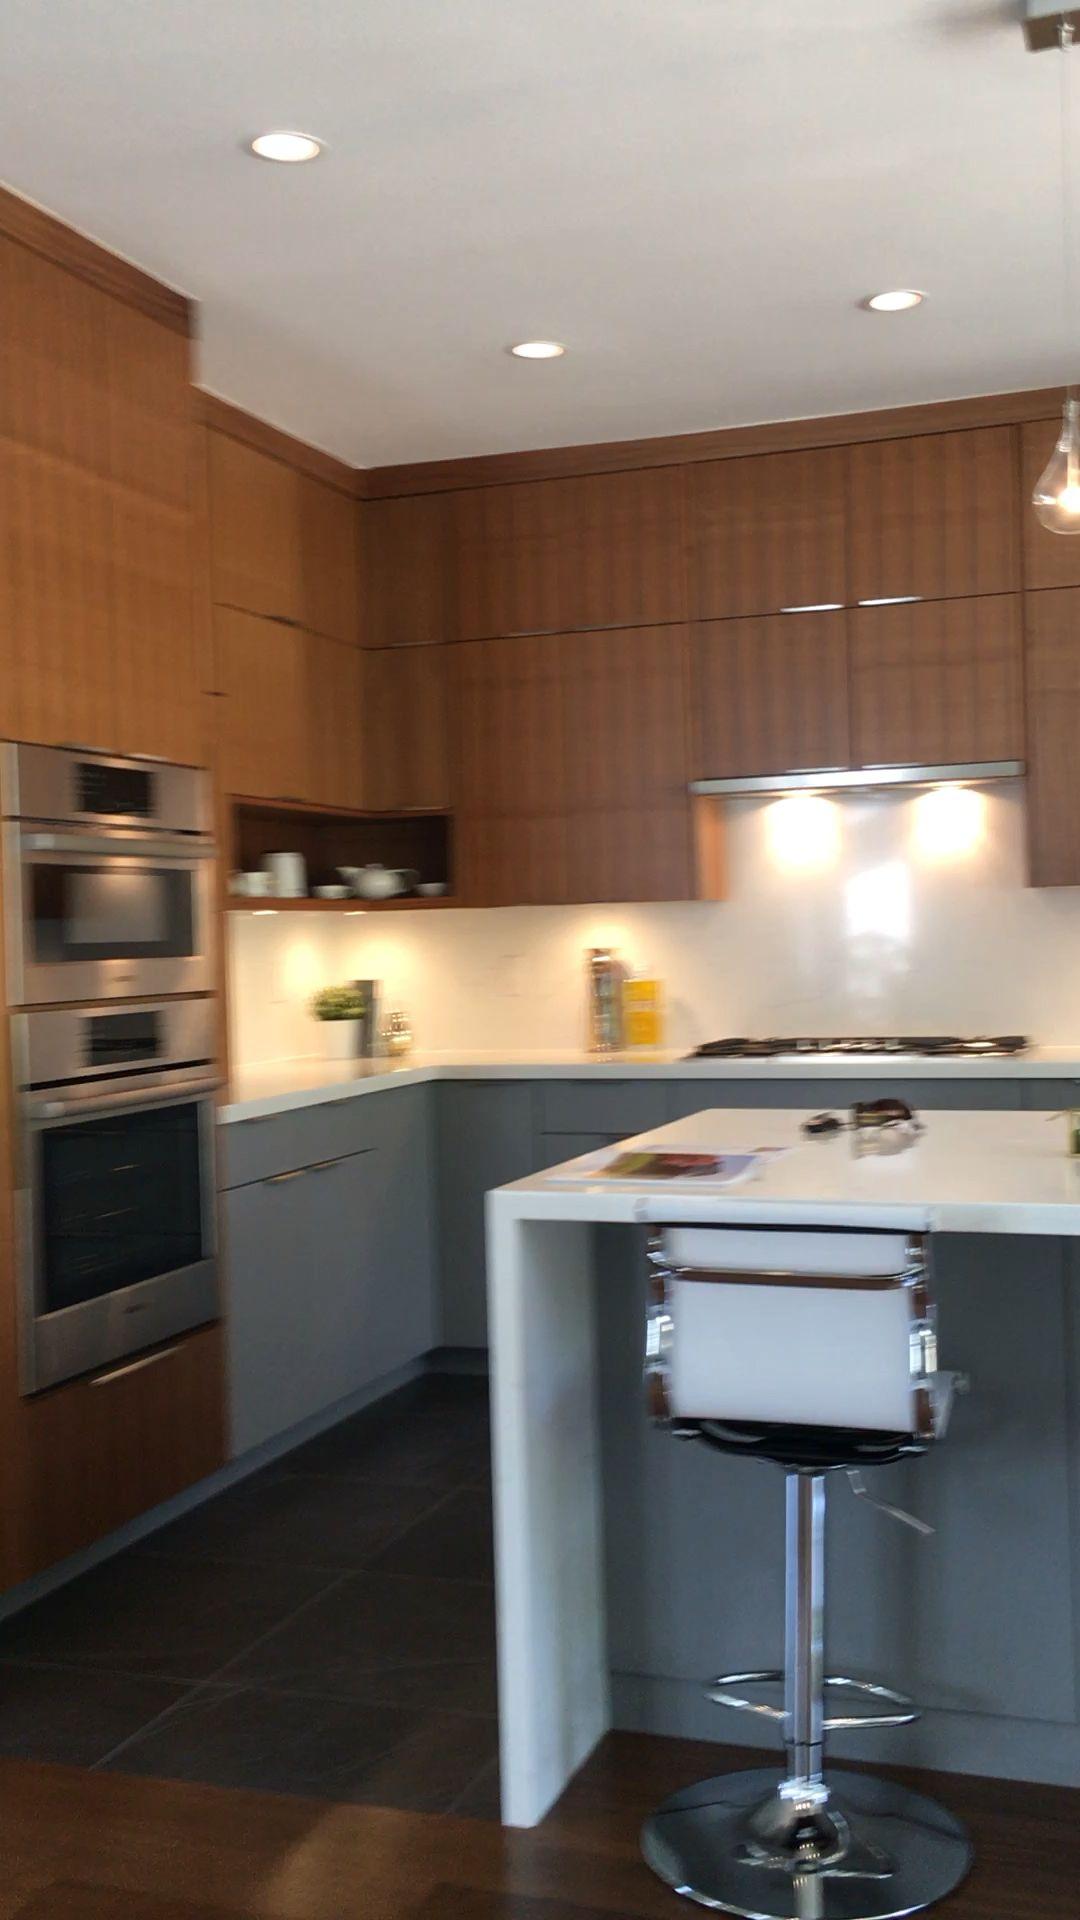 Photo of Cucina da sogno.